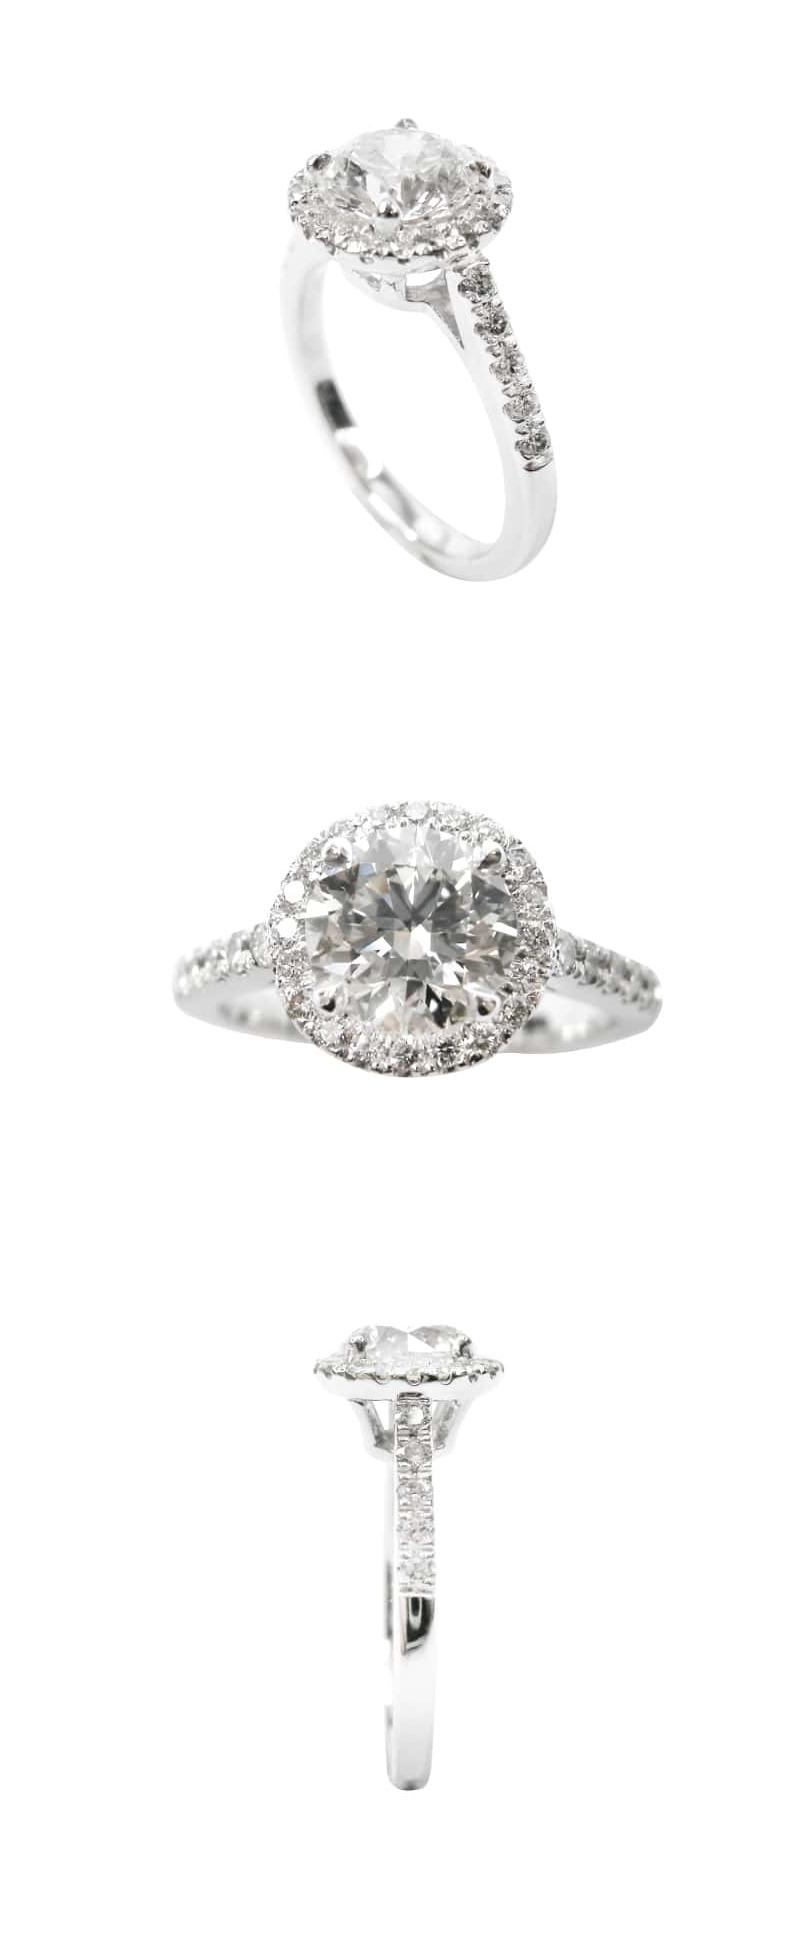 DIAMOND RING WITH HALO AND MICROSETTING BAND BESPOKE FINE JEWELLERY BY SHAHINA HATTA